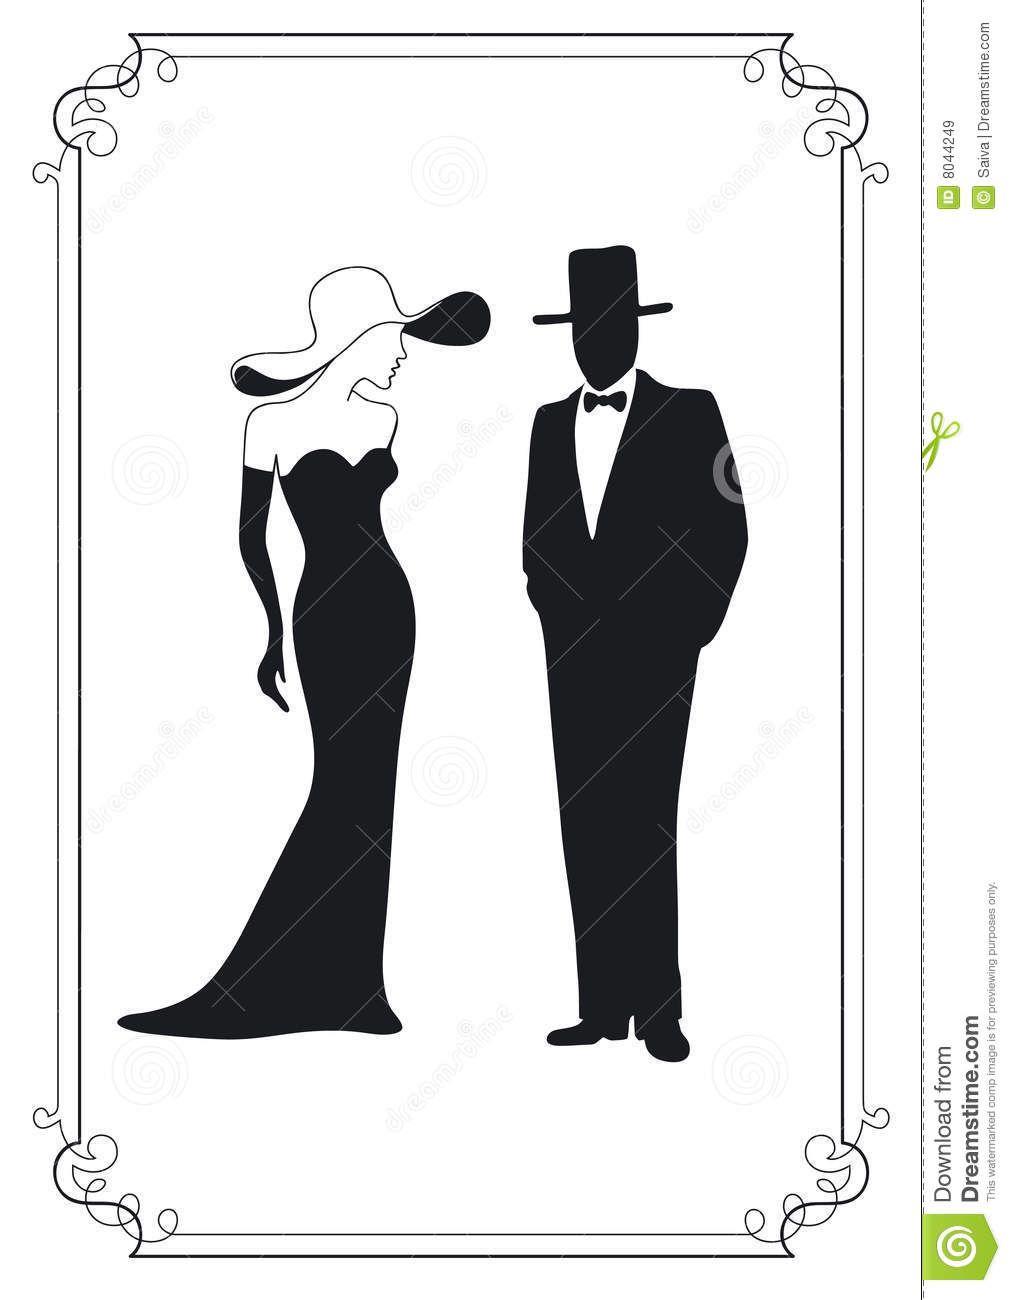 man and woman silhouette woman silhouette man and woman silhouette silhouette man and woman silhouette woman